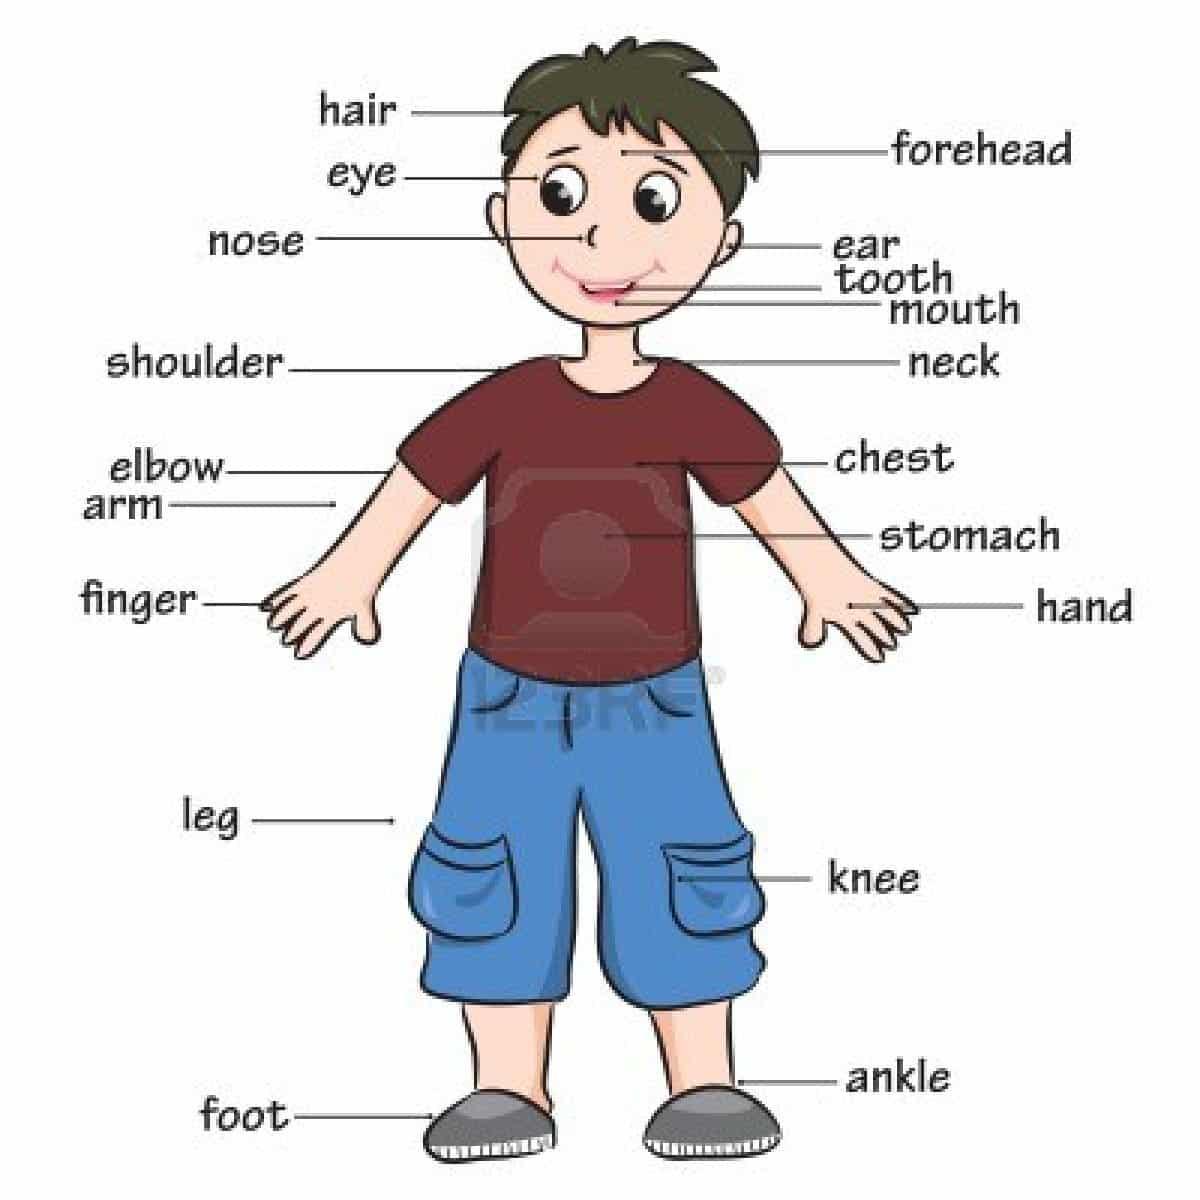 Partes del cuerpo humano en inglés - Number16Kids